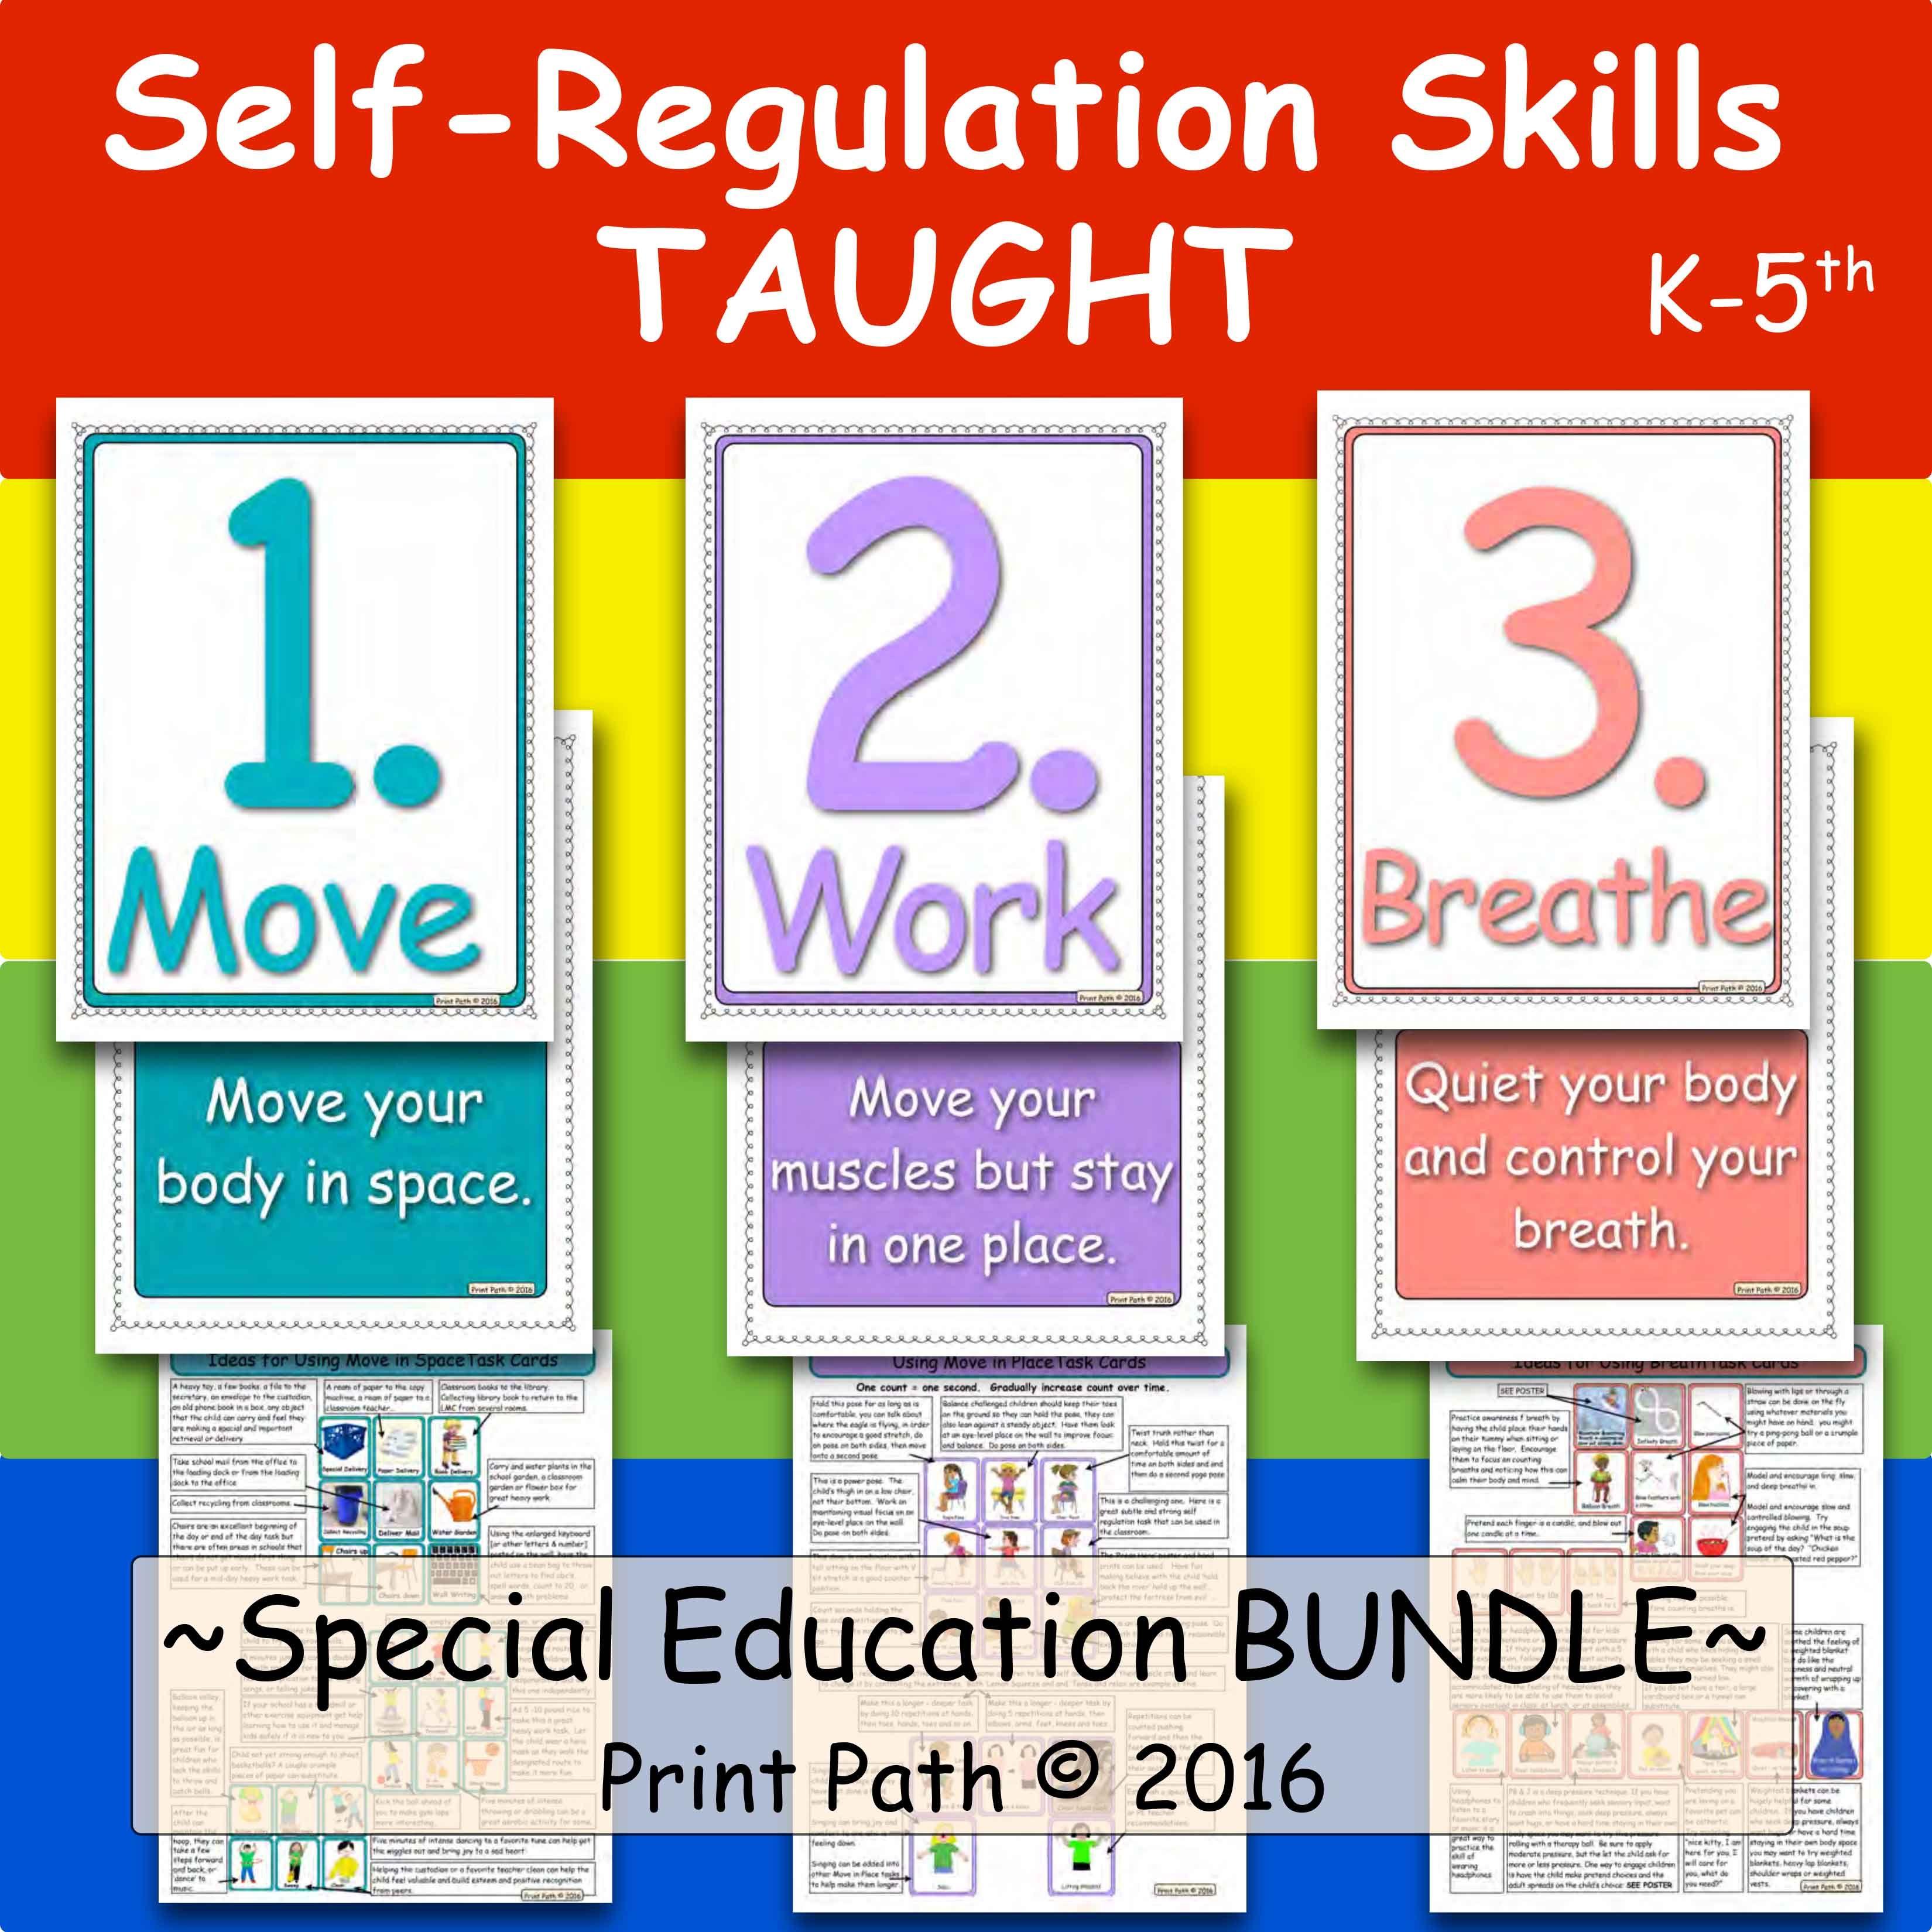 Self Regulation Skills Taught